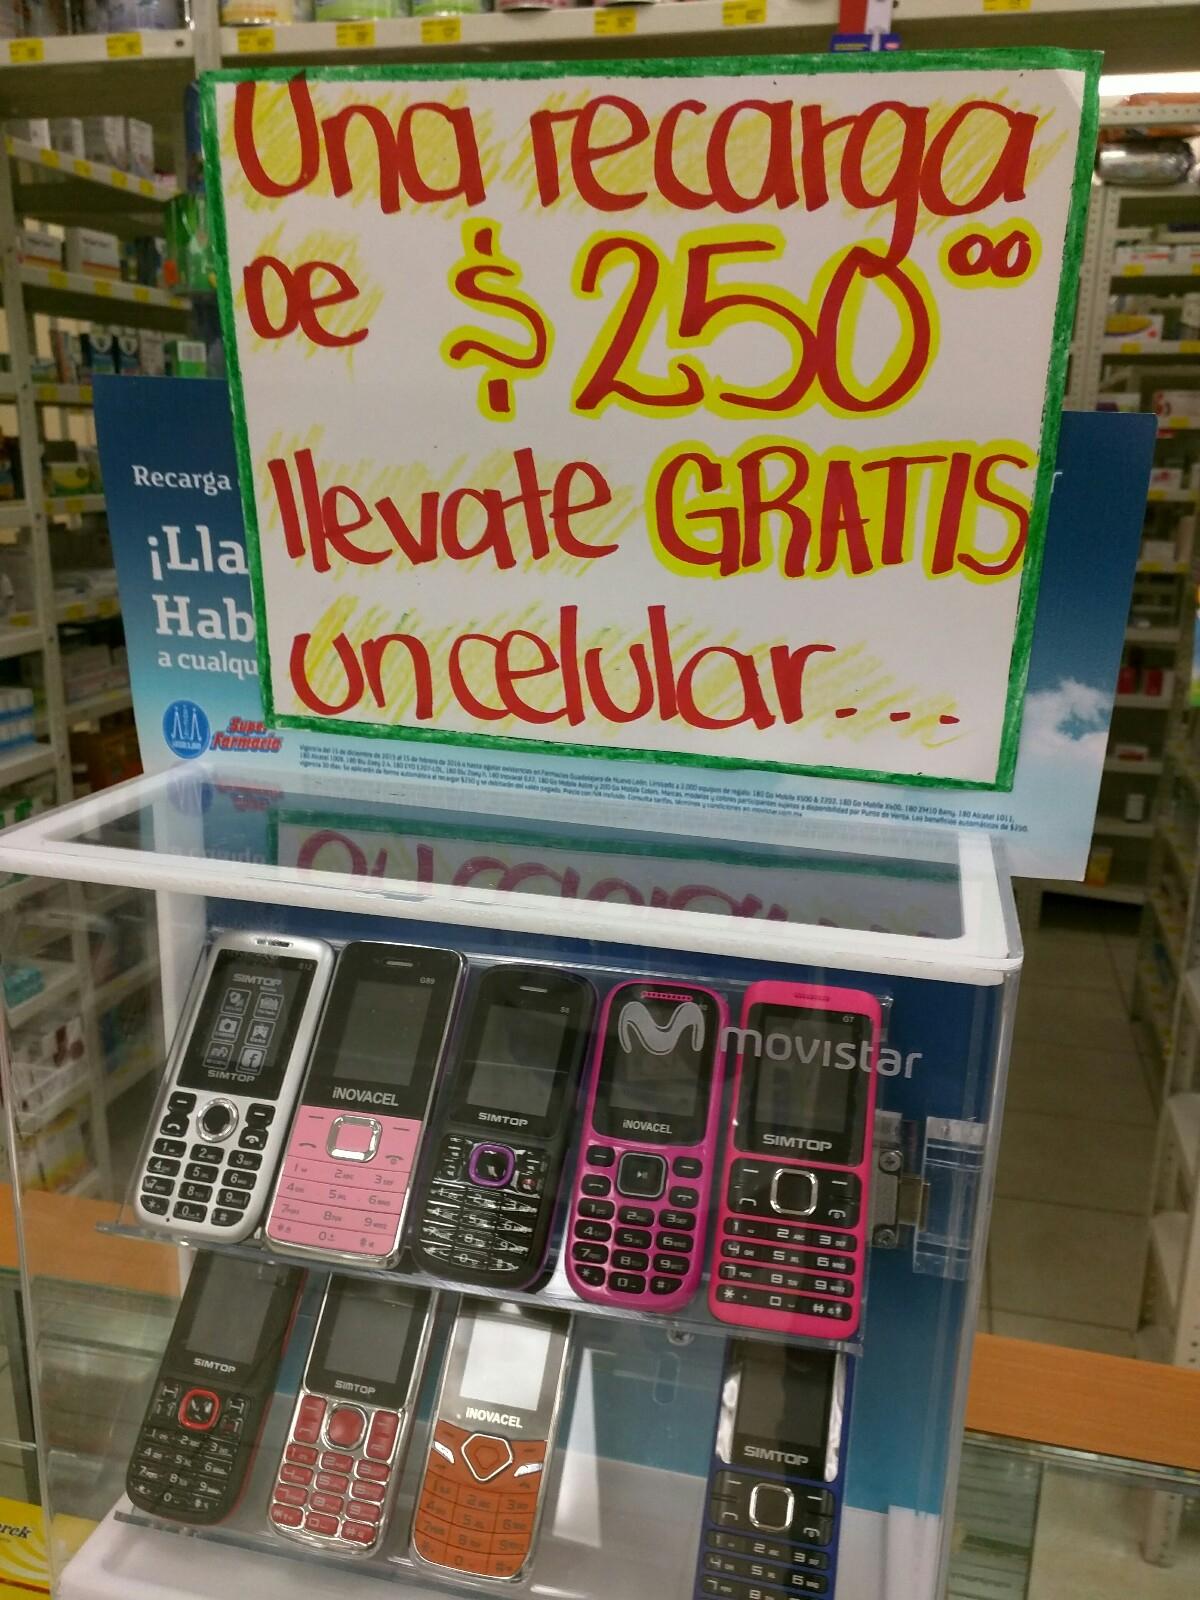 Farmacias Guadalajara: Celular gratis en recargas de $250